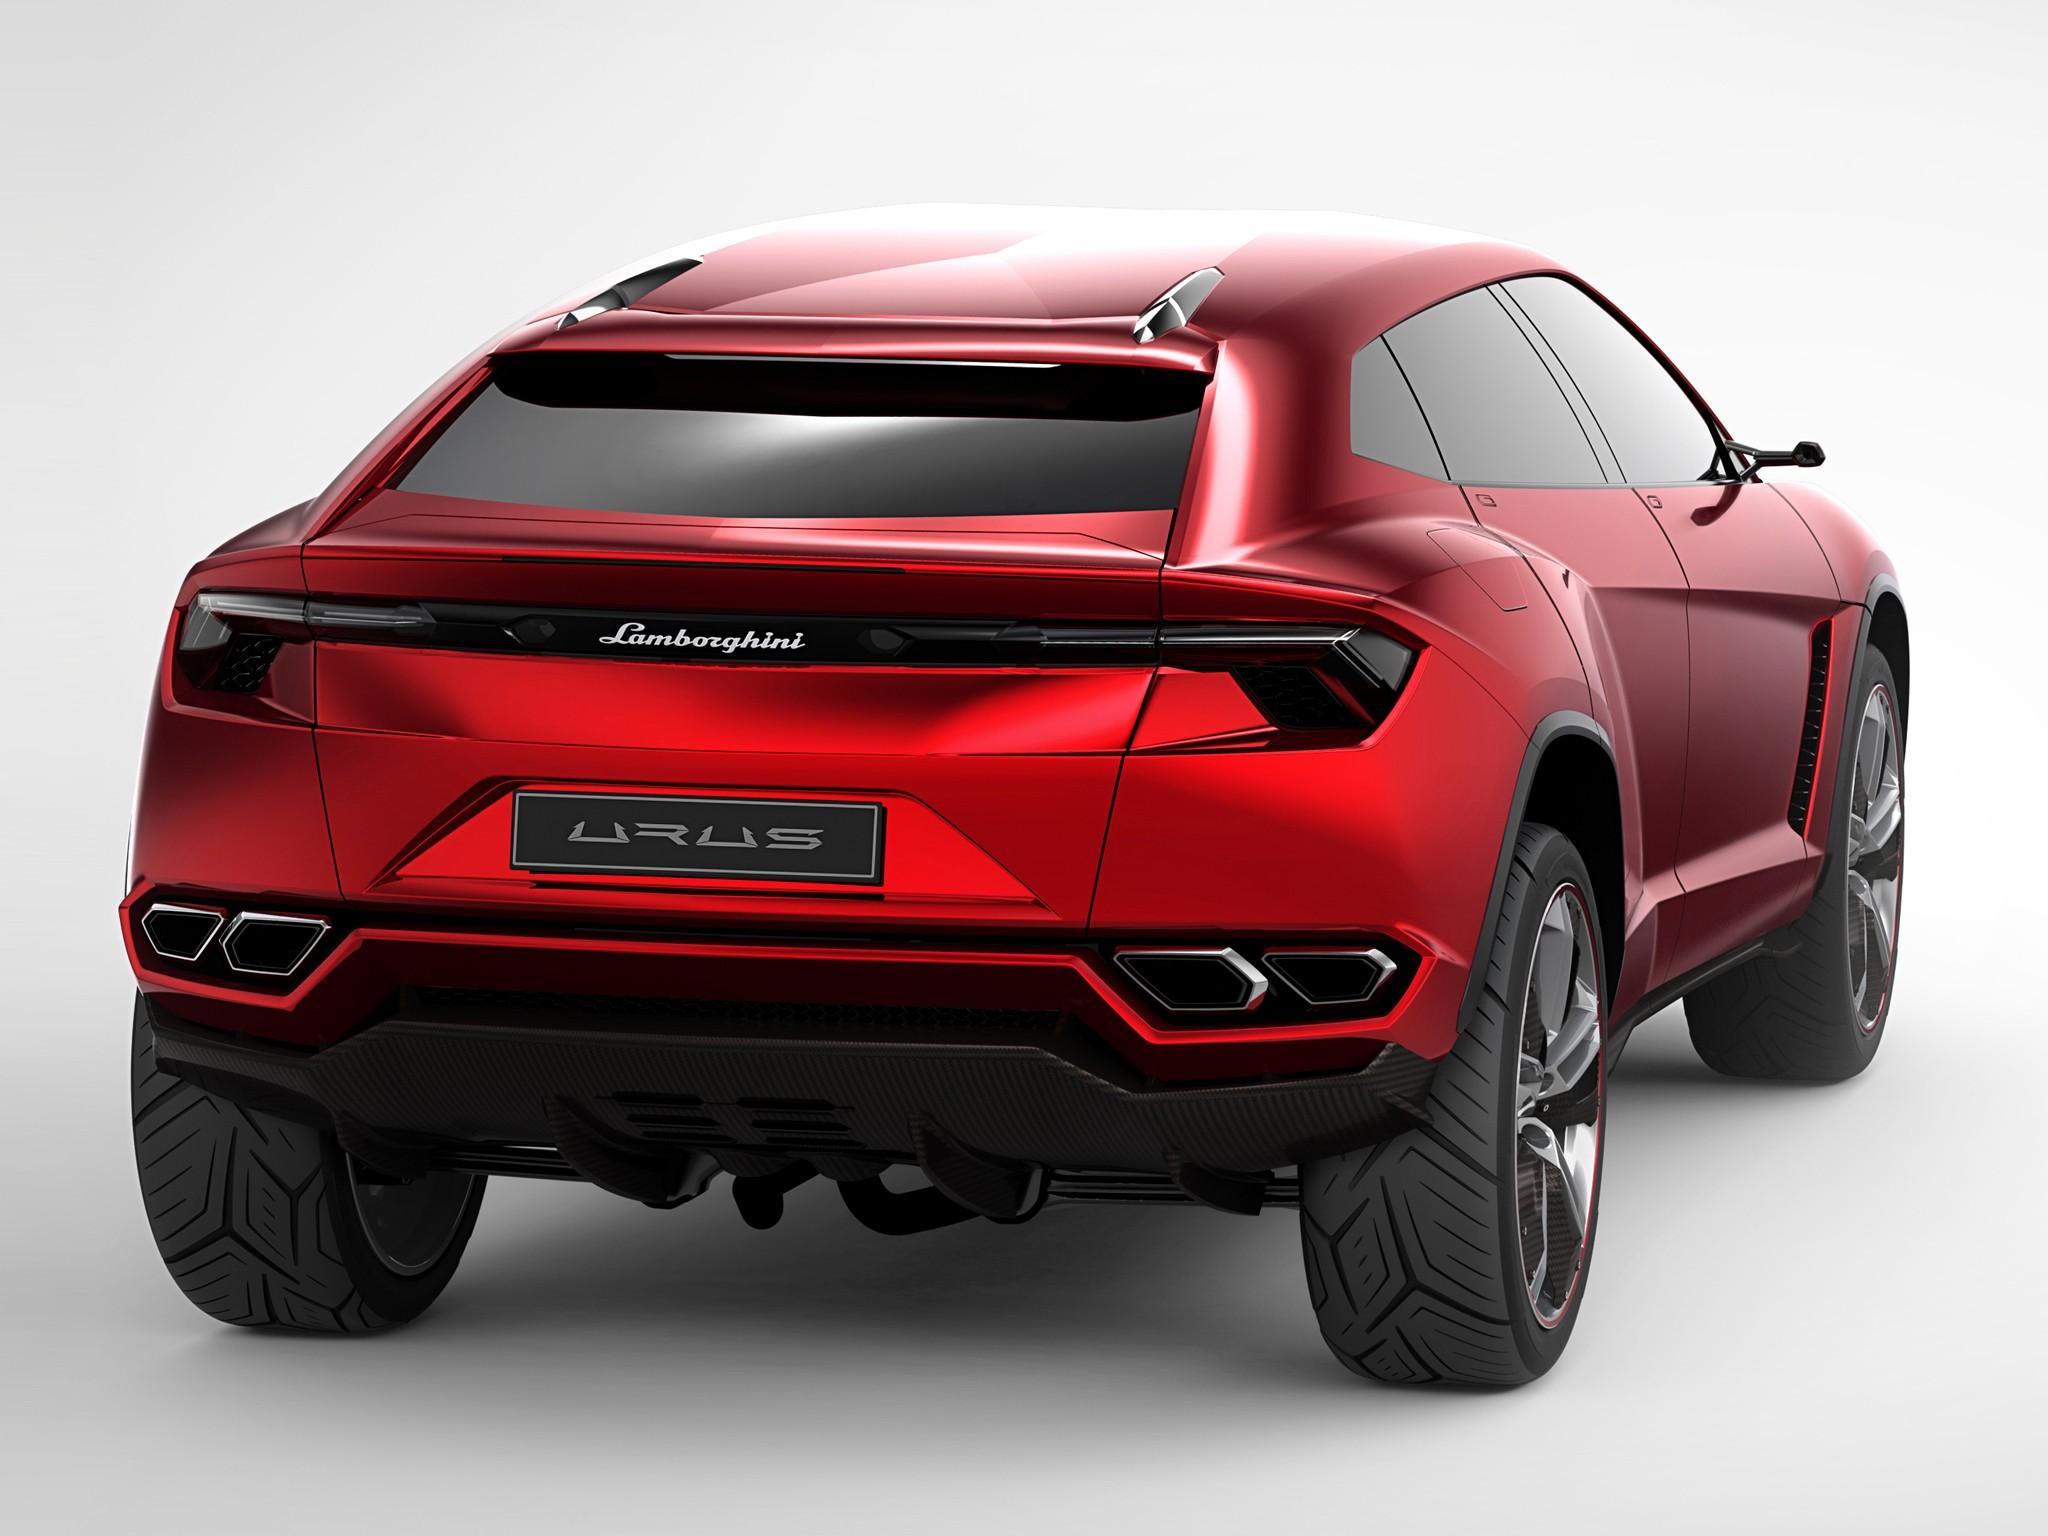 ... Lamborghini Urus SUV (concept Version) ...